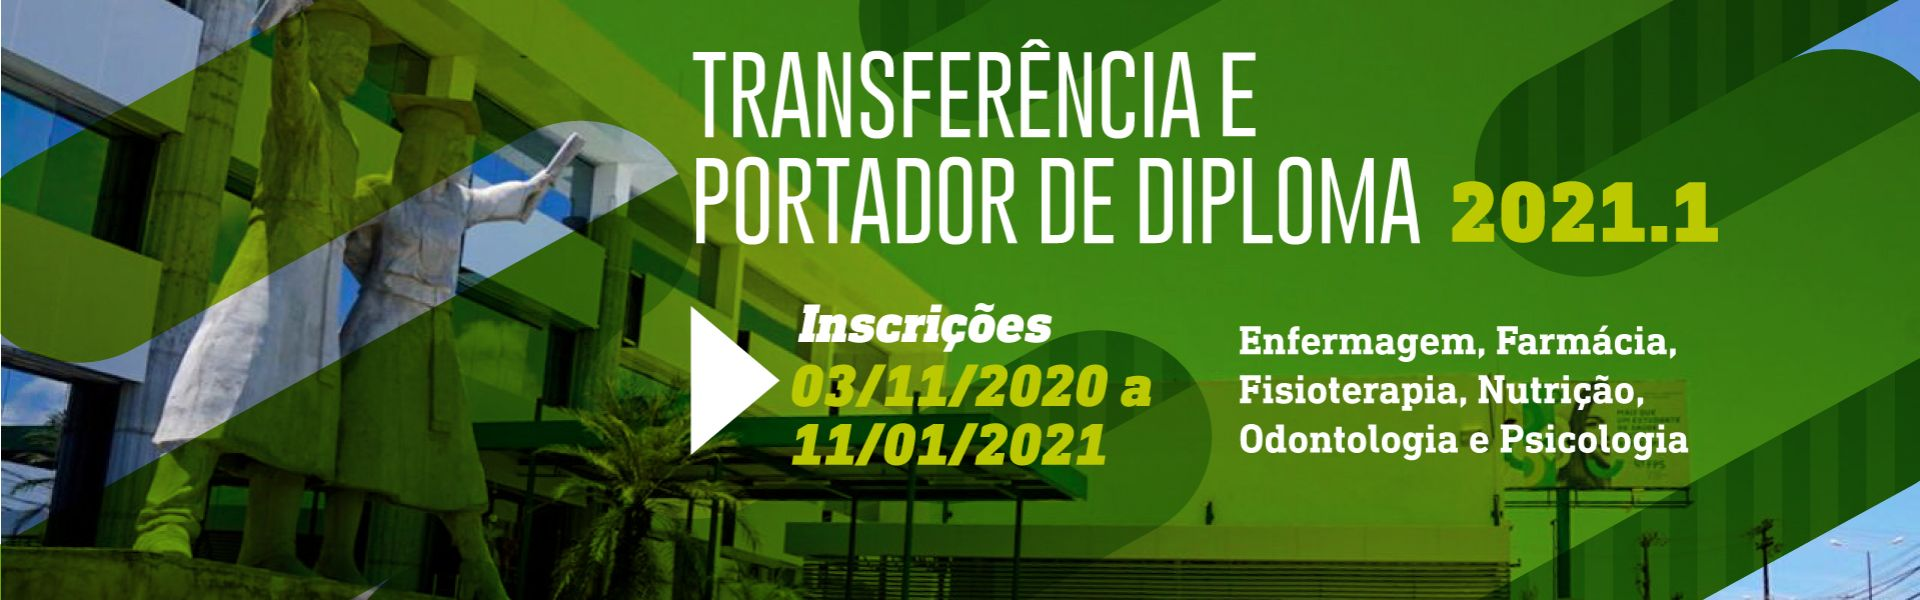 transferência e portador de diploma 2021.1